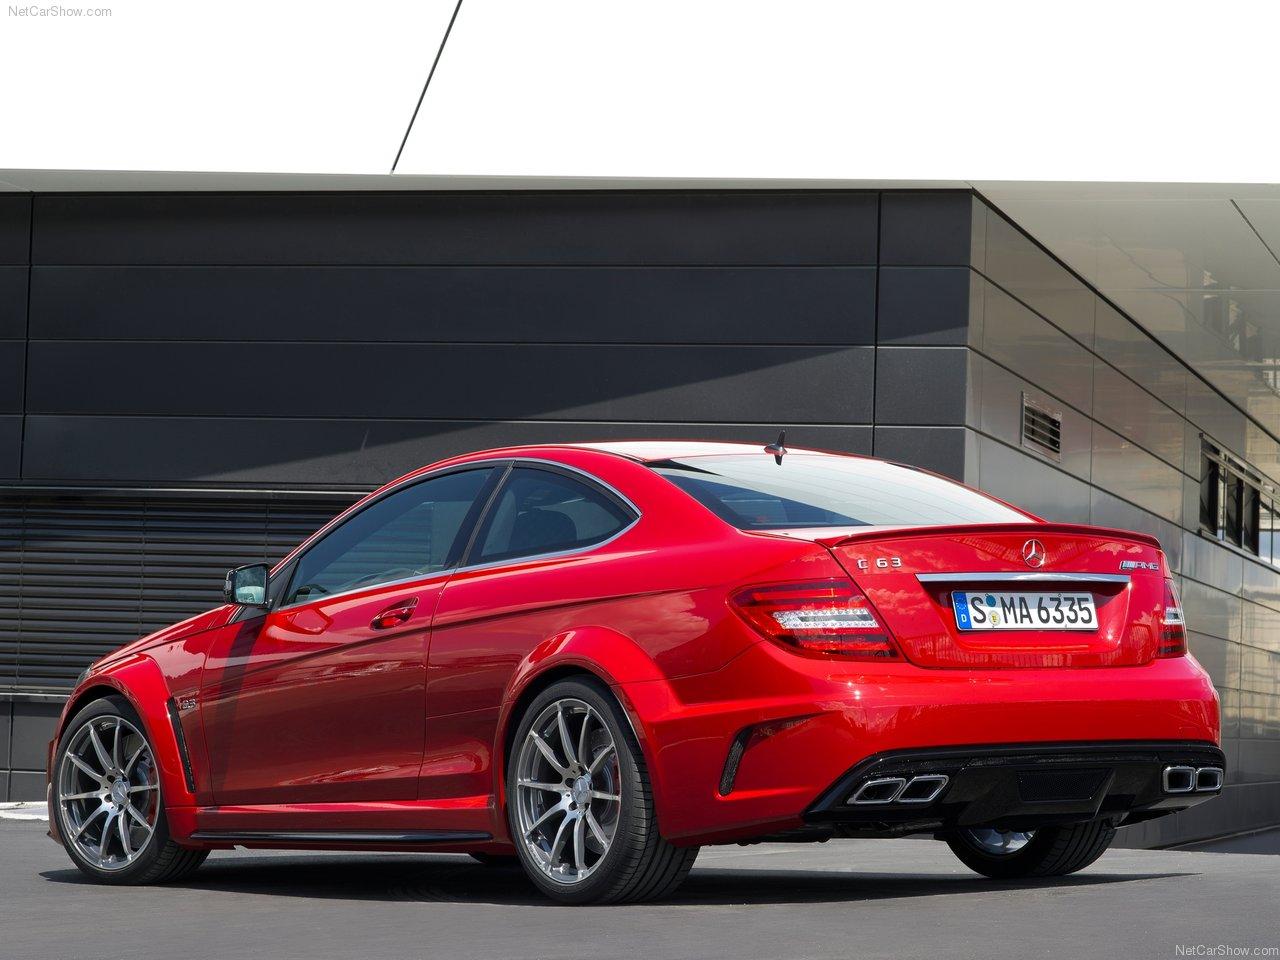 http://2.bp.blogspot.com/-Jcc_Tcy2X3o/TkLvWpaZS5I/AAAAAAAADGQ/FkuB-Rtvcq8/s1600/Mercedes-Benz-C63_AMG_Coupe_Black_Series_2012_1280x960_wallpaper_0e.jpg